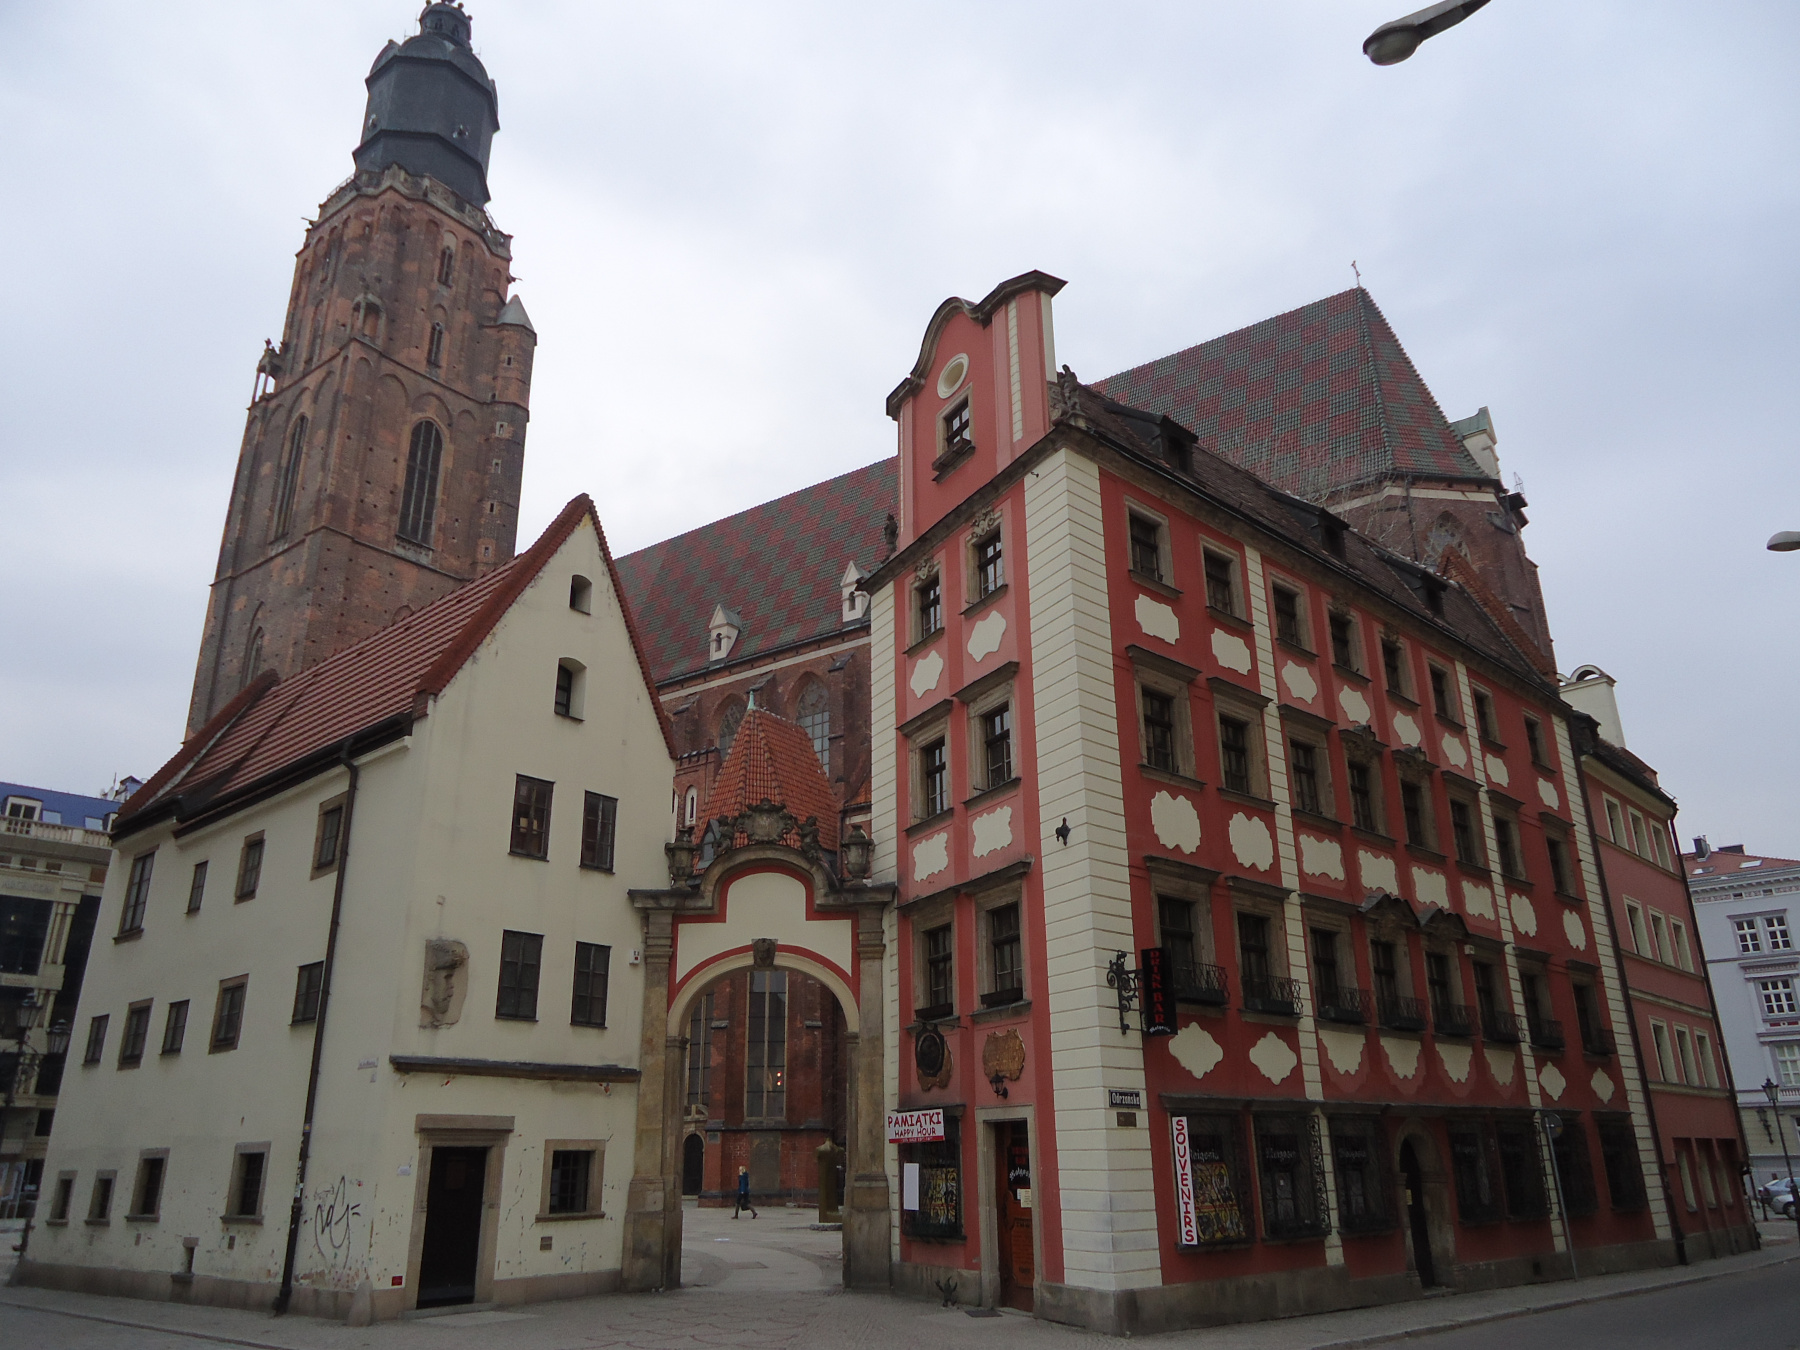 Костел Святой Елизаветы (Kosciol Sw. Elzbiety)